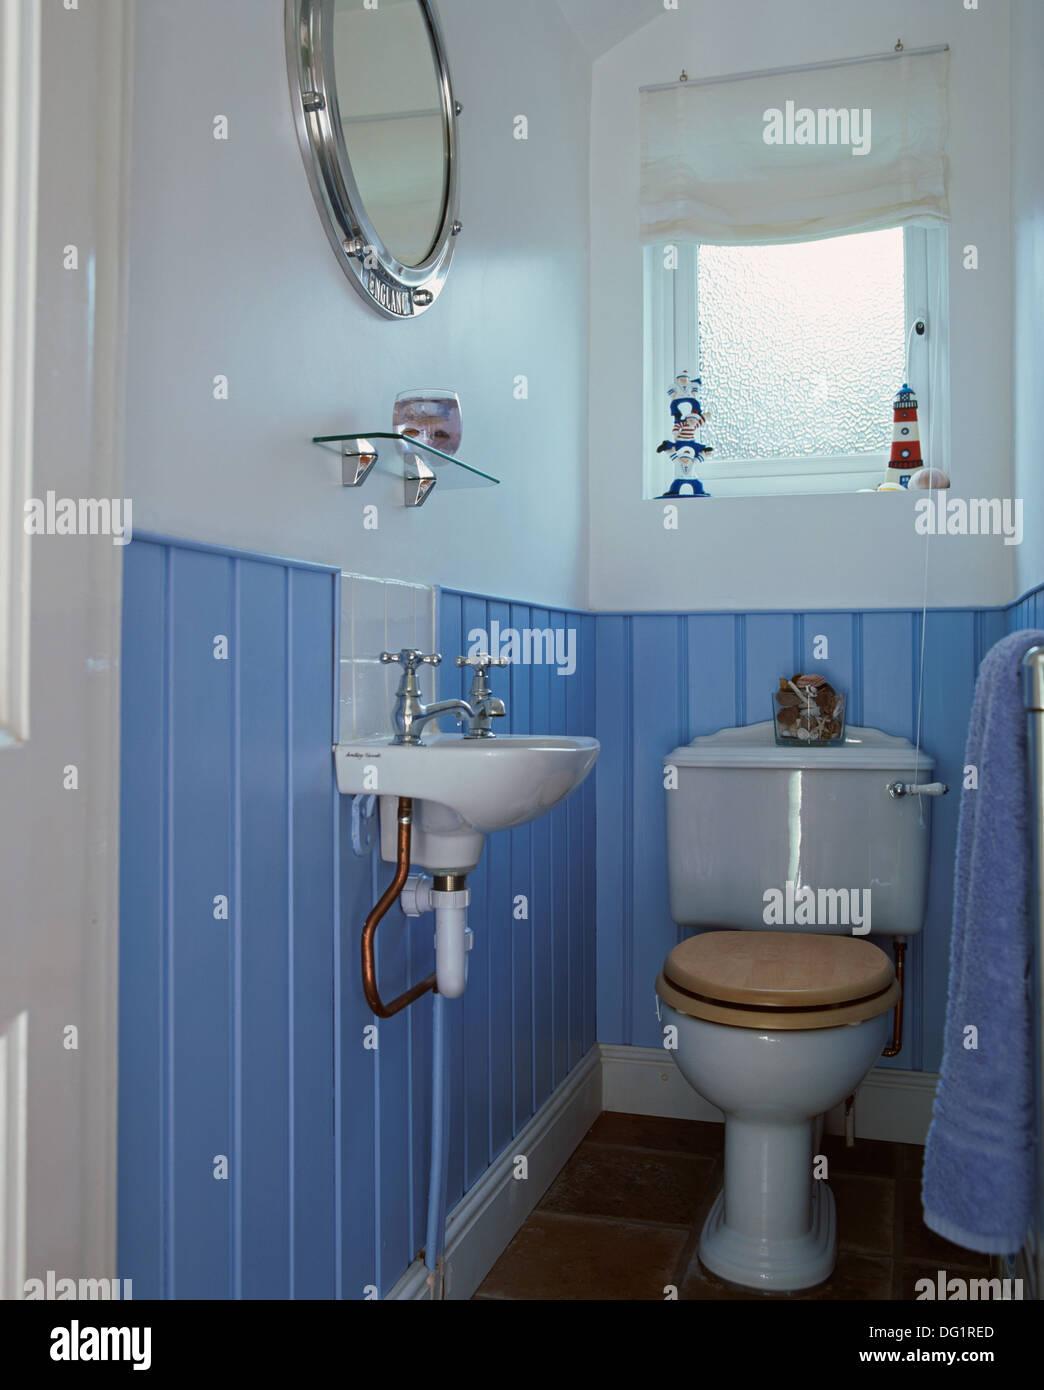 Paneling Blue Domestic Stock Photos & Paneling Blue Domestic Stock ...